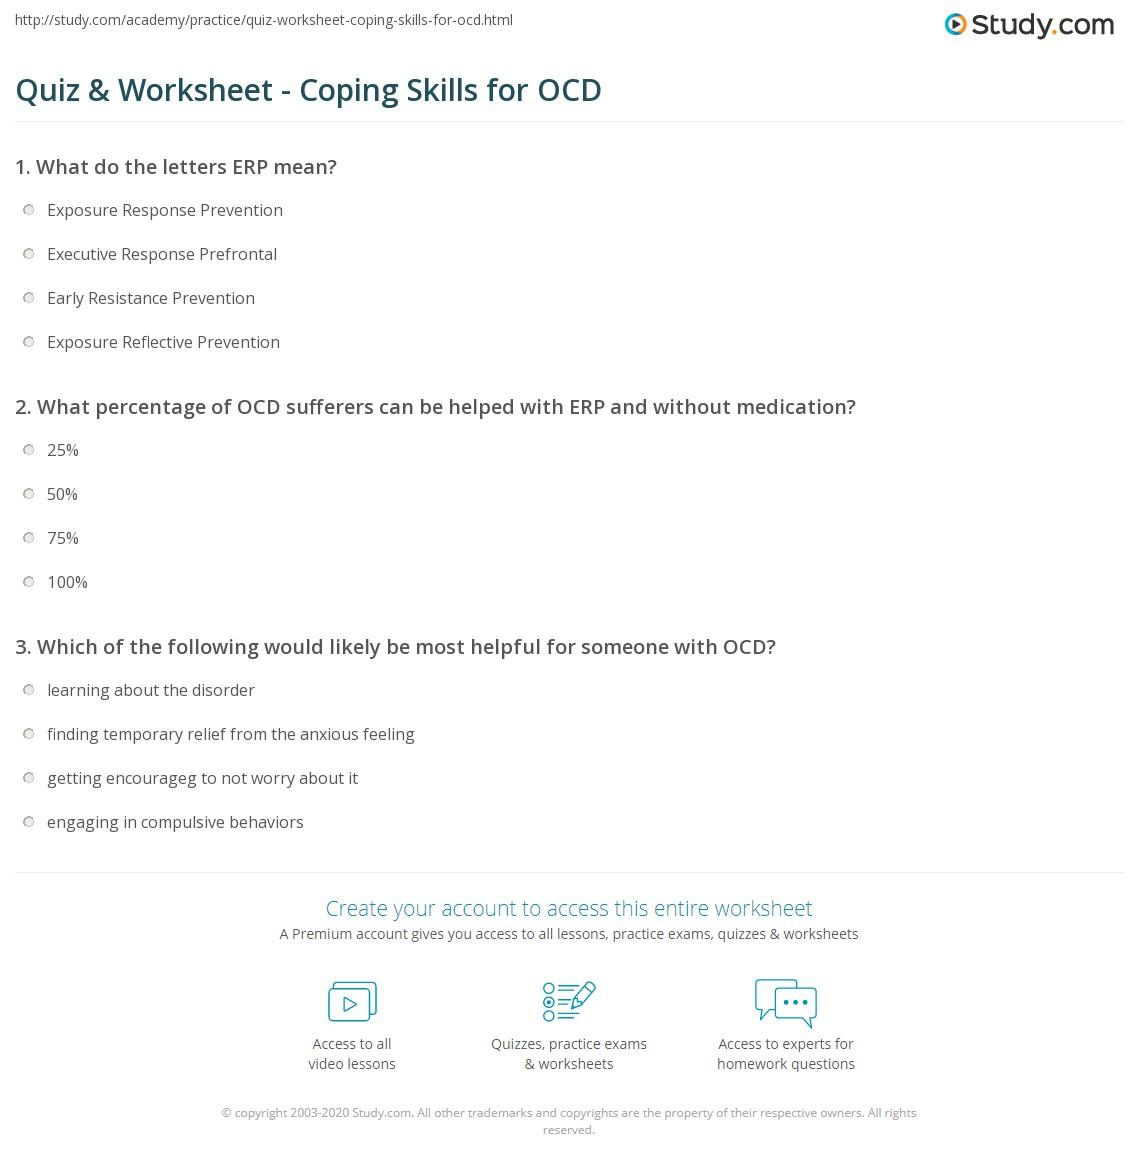 Quiz Worksheet Coping Skills For Ocd Study Com